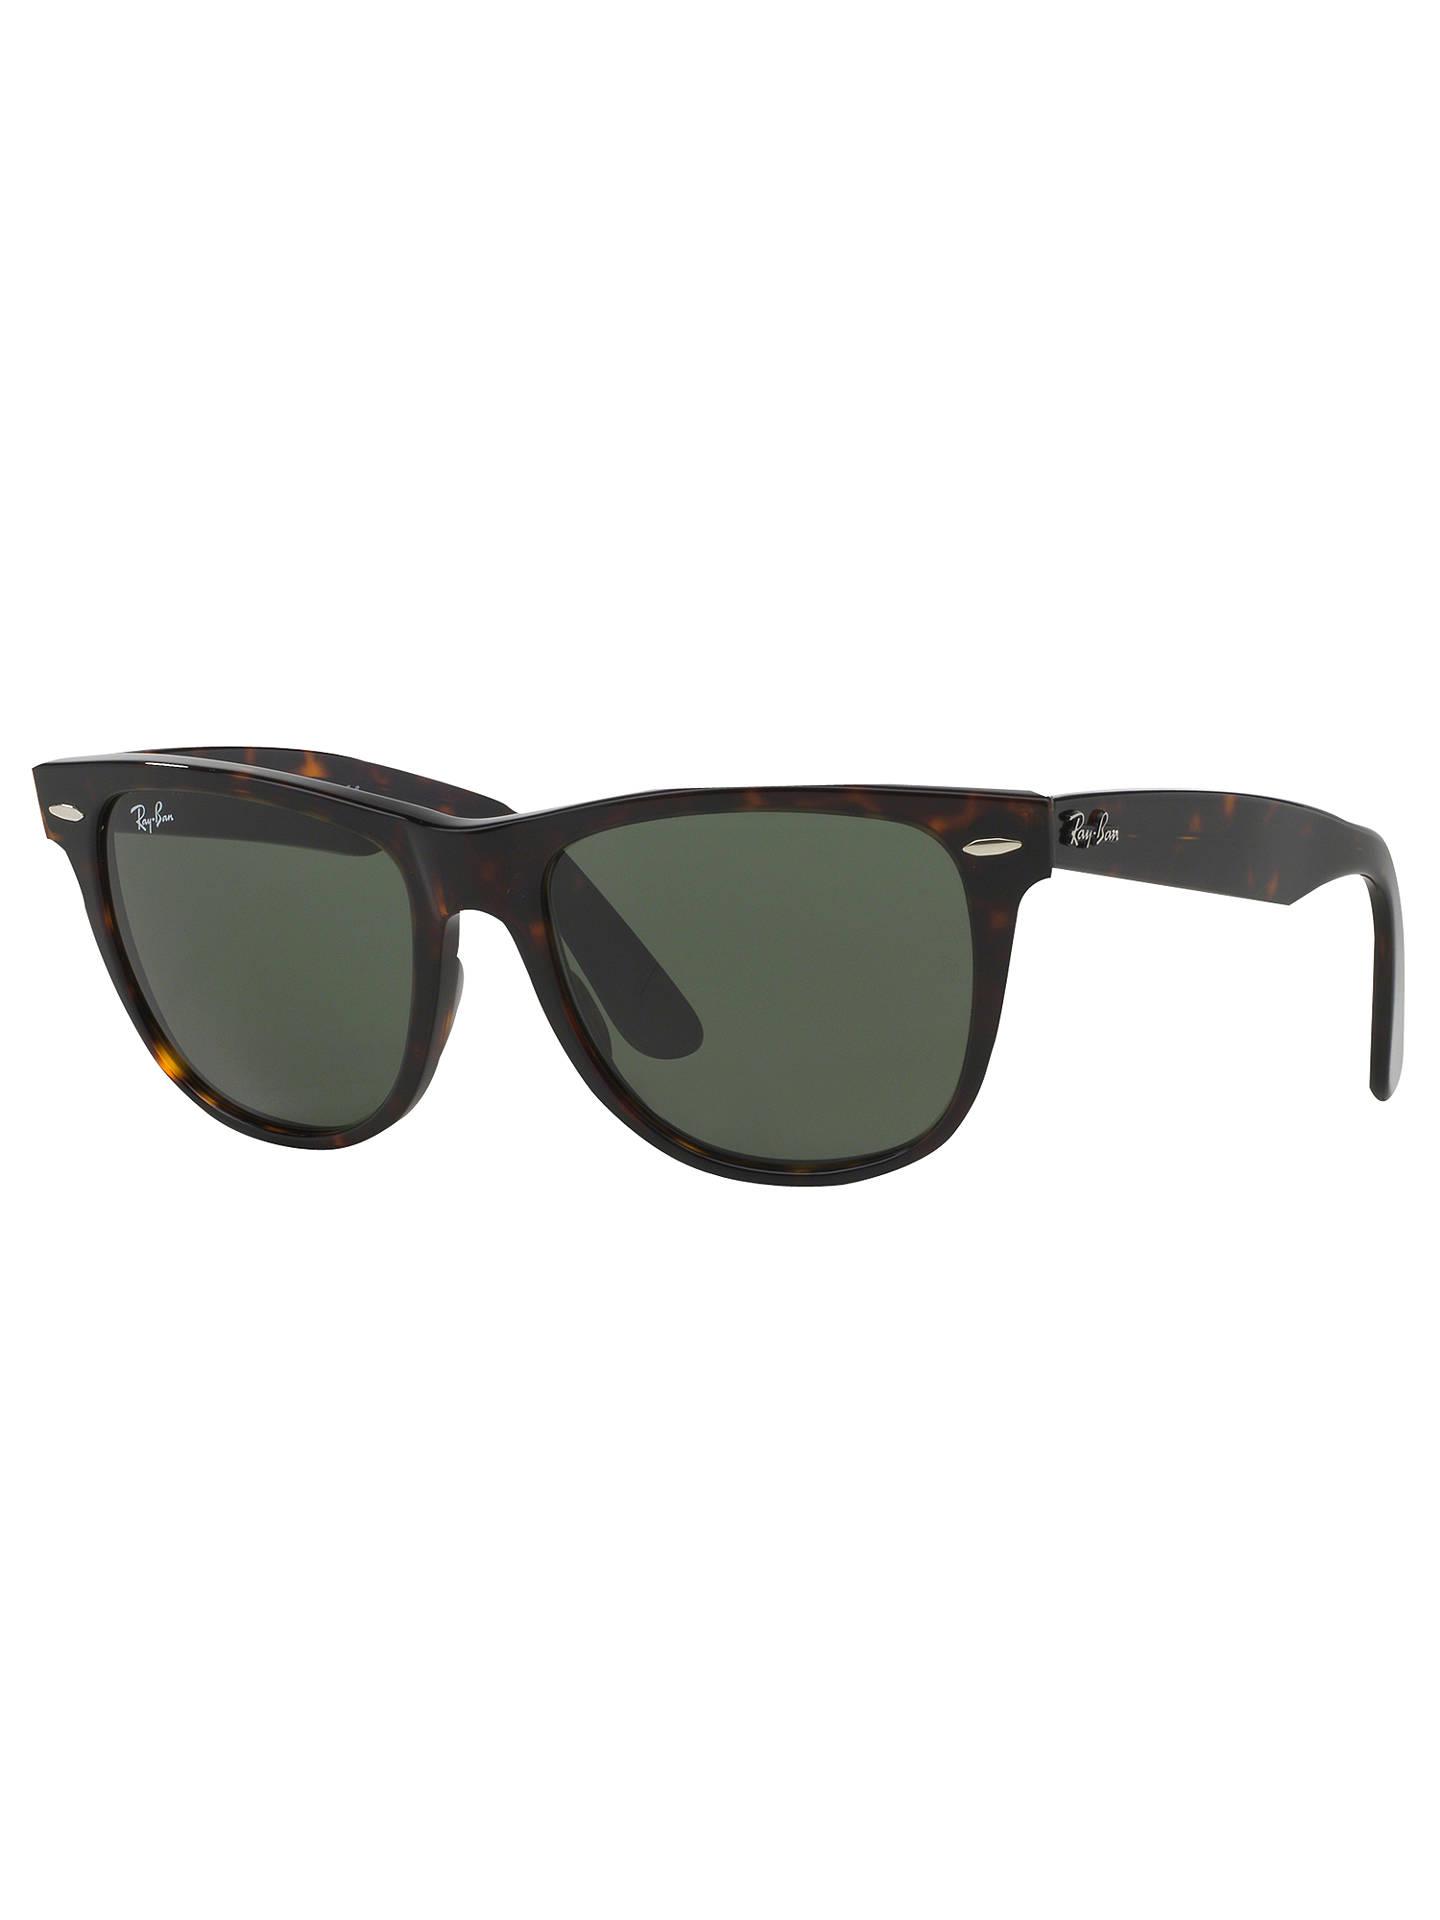 527d7939be4 Ray-Ban RB2140 Original Wayfarer® Sunglasses at John Lewis   Partners